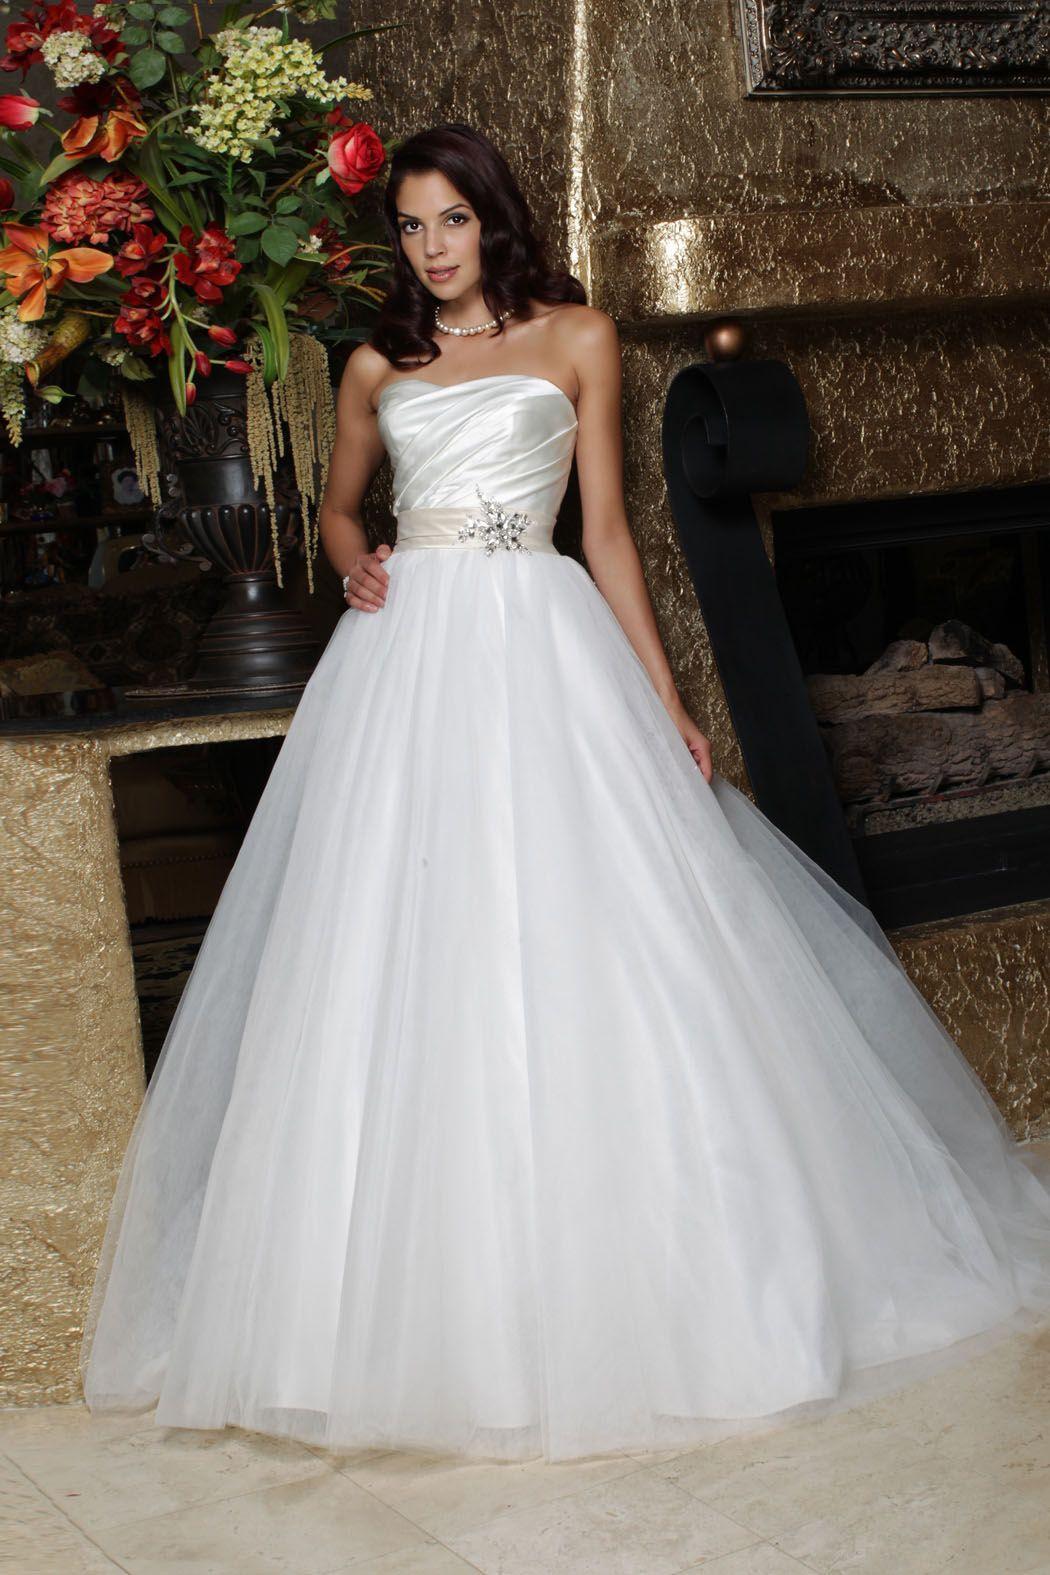 Da Vinci 2013 Wedding Gown. Available in Diamond White/Champagne, Diamond White/Diamond White, White/Champagne and White/White. #tulle #ballgown #satin #beaded #50163